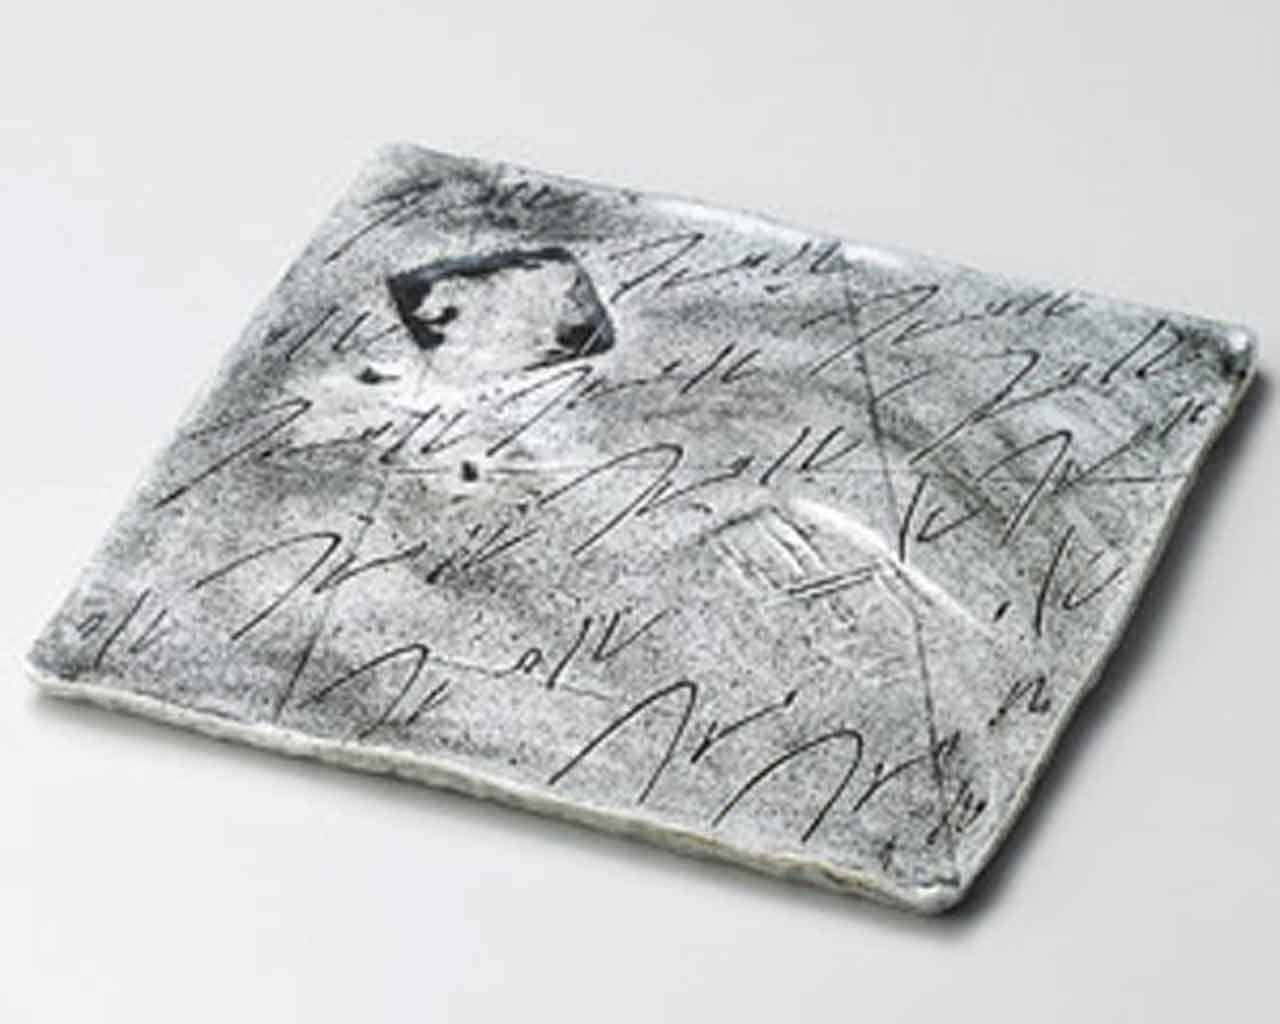 Hakuji Lines 8.1inch Set of 5 Medium Plates Grey porcelain Made in Japan